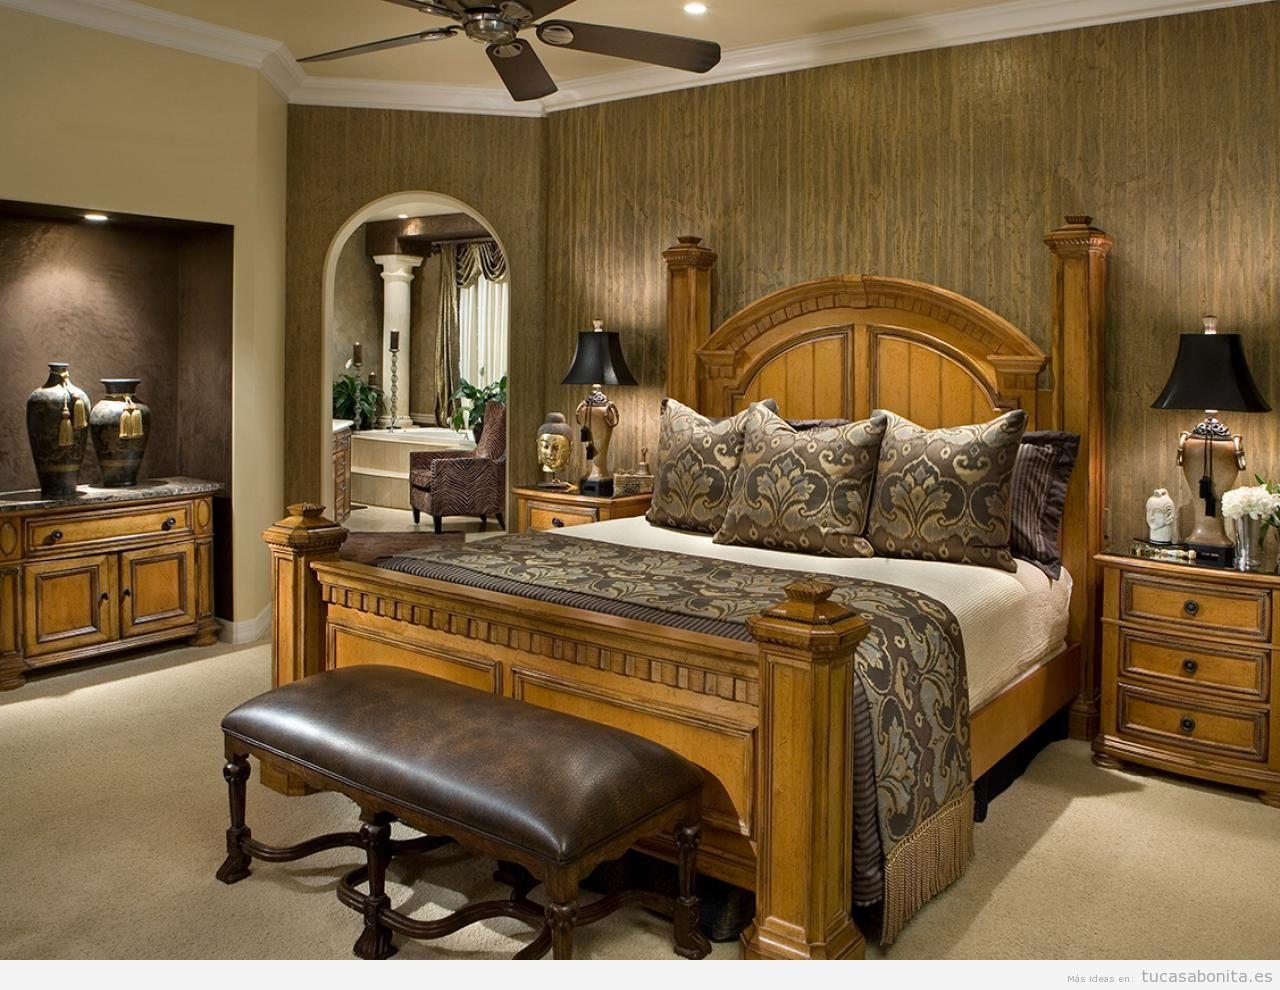 Ideas decorar dormitorio matrimonio, distintos estilos 7